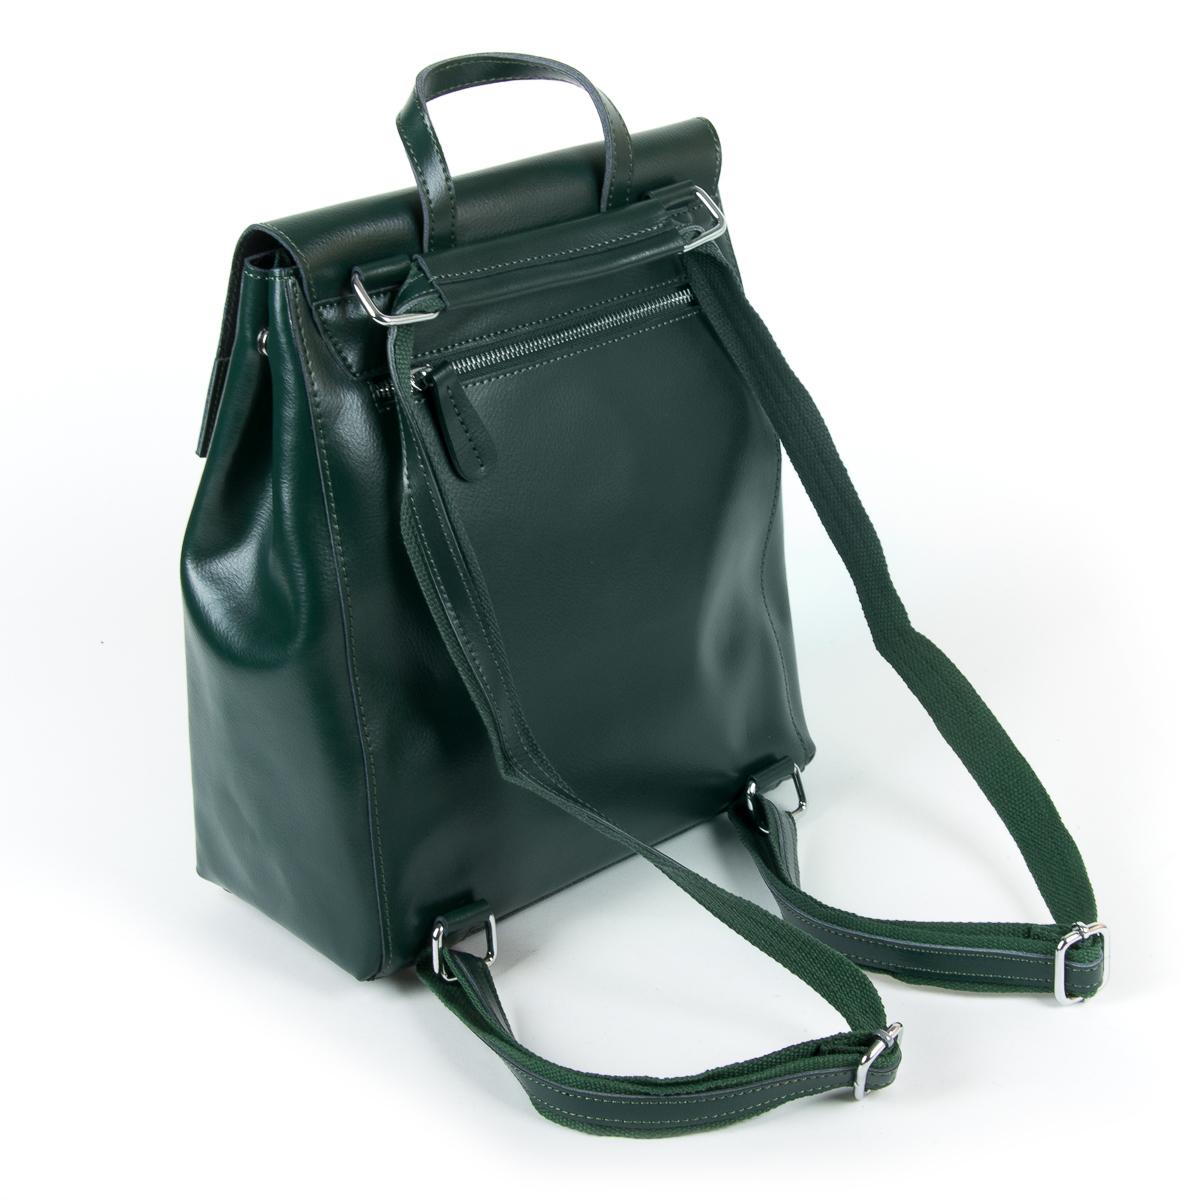 Сумка Женская Рюкзак кожа ALEX RAI 9-01 373 green - фото 4